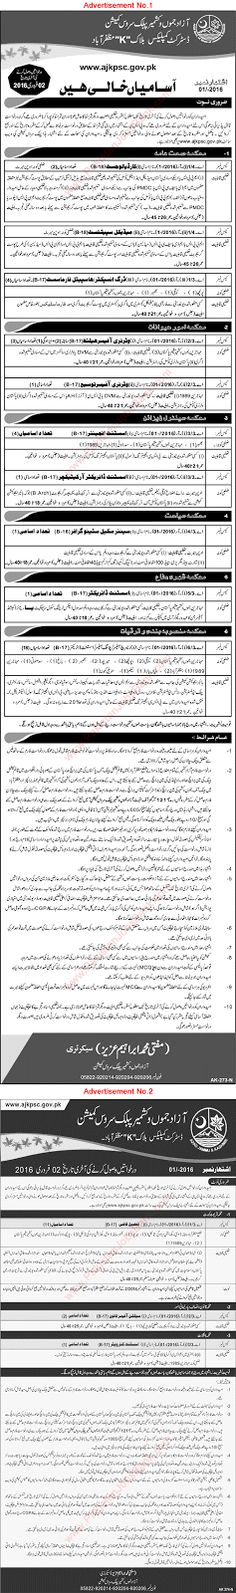 AJK PSC Jobs 2016 January Advertisement No 01/2016 1/2016 AJK Public Service Commission Latest - Jobs in Pakistan, Karachi, Lahore, Rawalpindi, Islamabad, Peshawar; published in Jang, Express